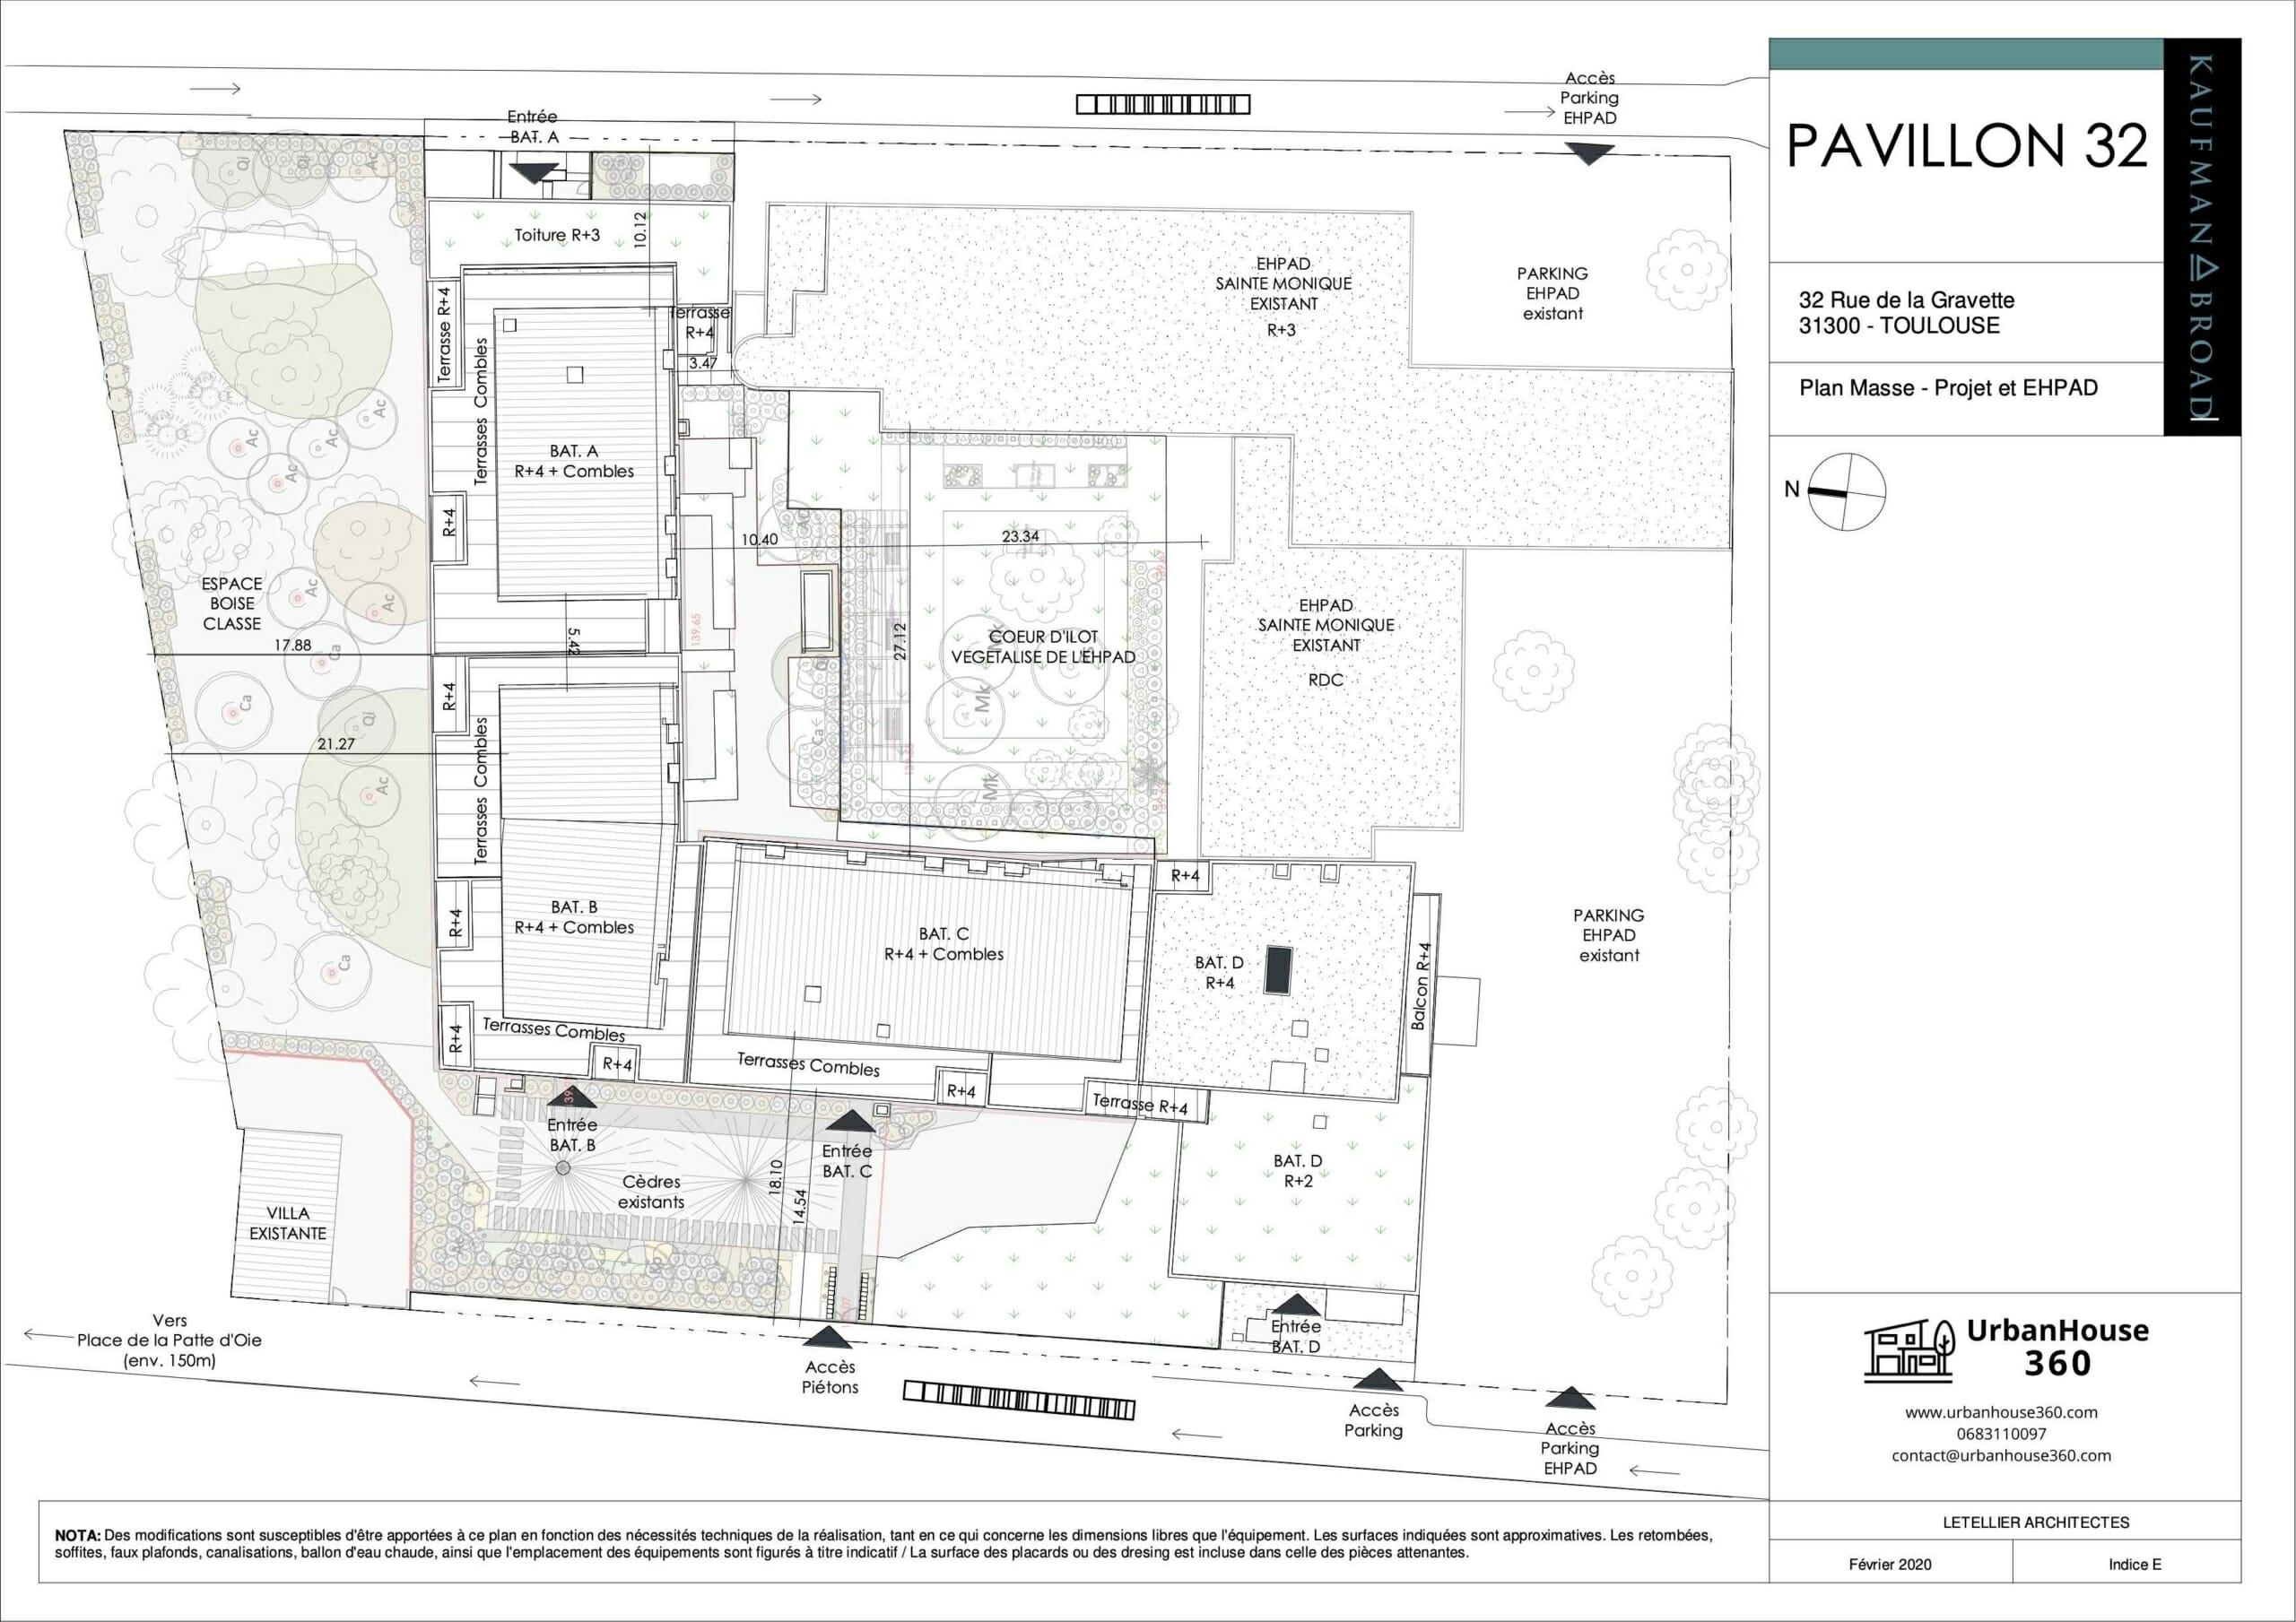 UrbanHouse360-Pavillon32- RDC 2